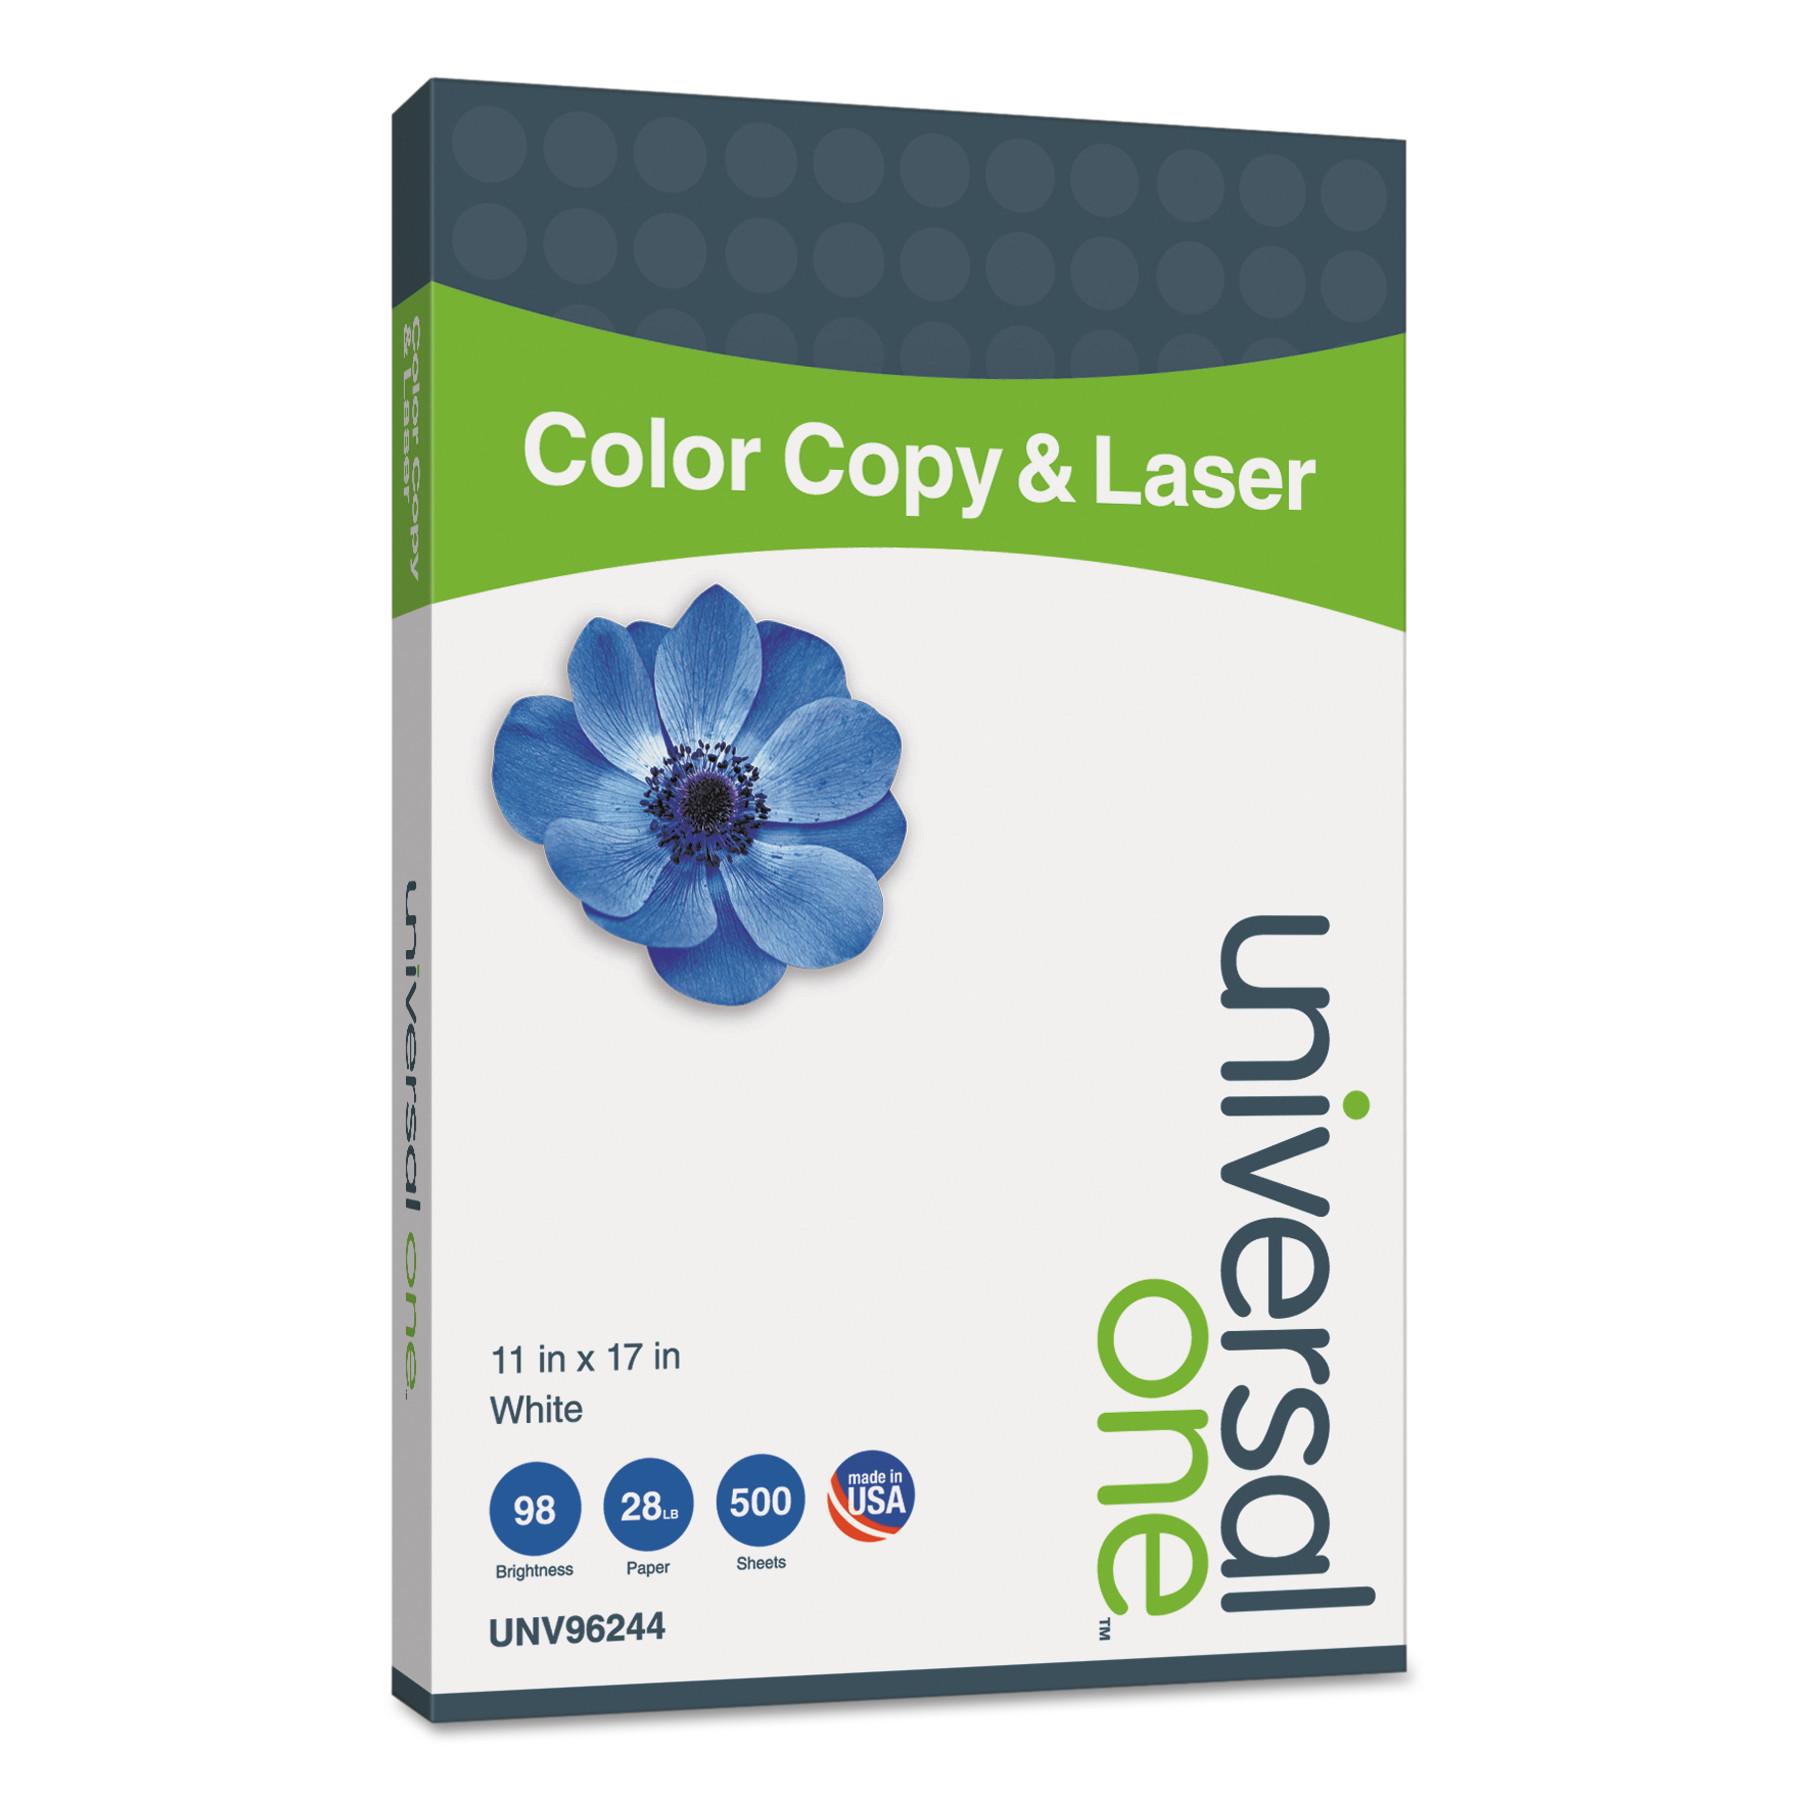 Universal Copier/Laser Paper, 98 Brightness, 28lb, 11 x 17, White, 500 Sheets/Ream -UNV96244